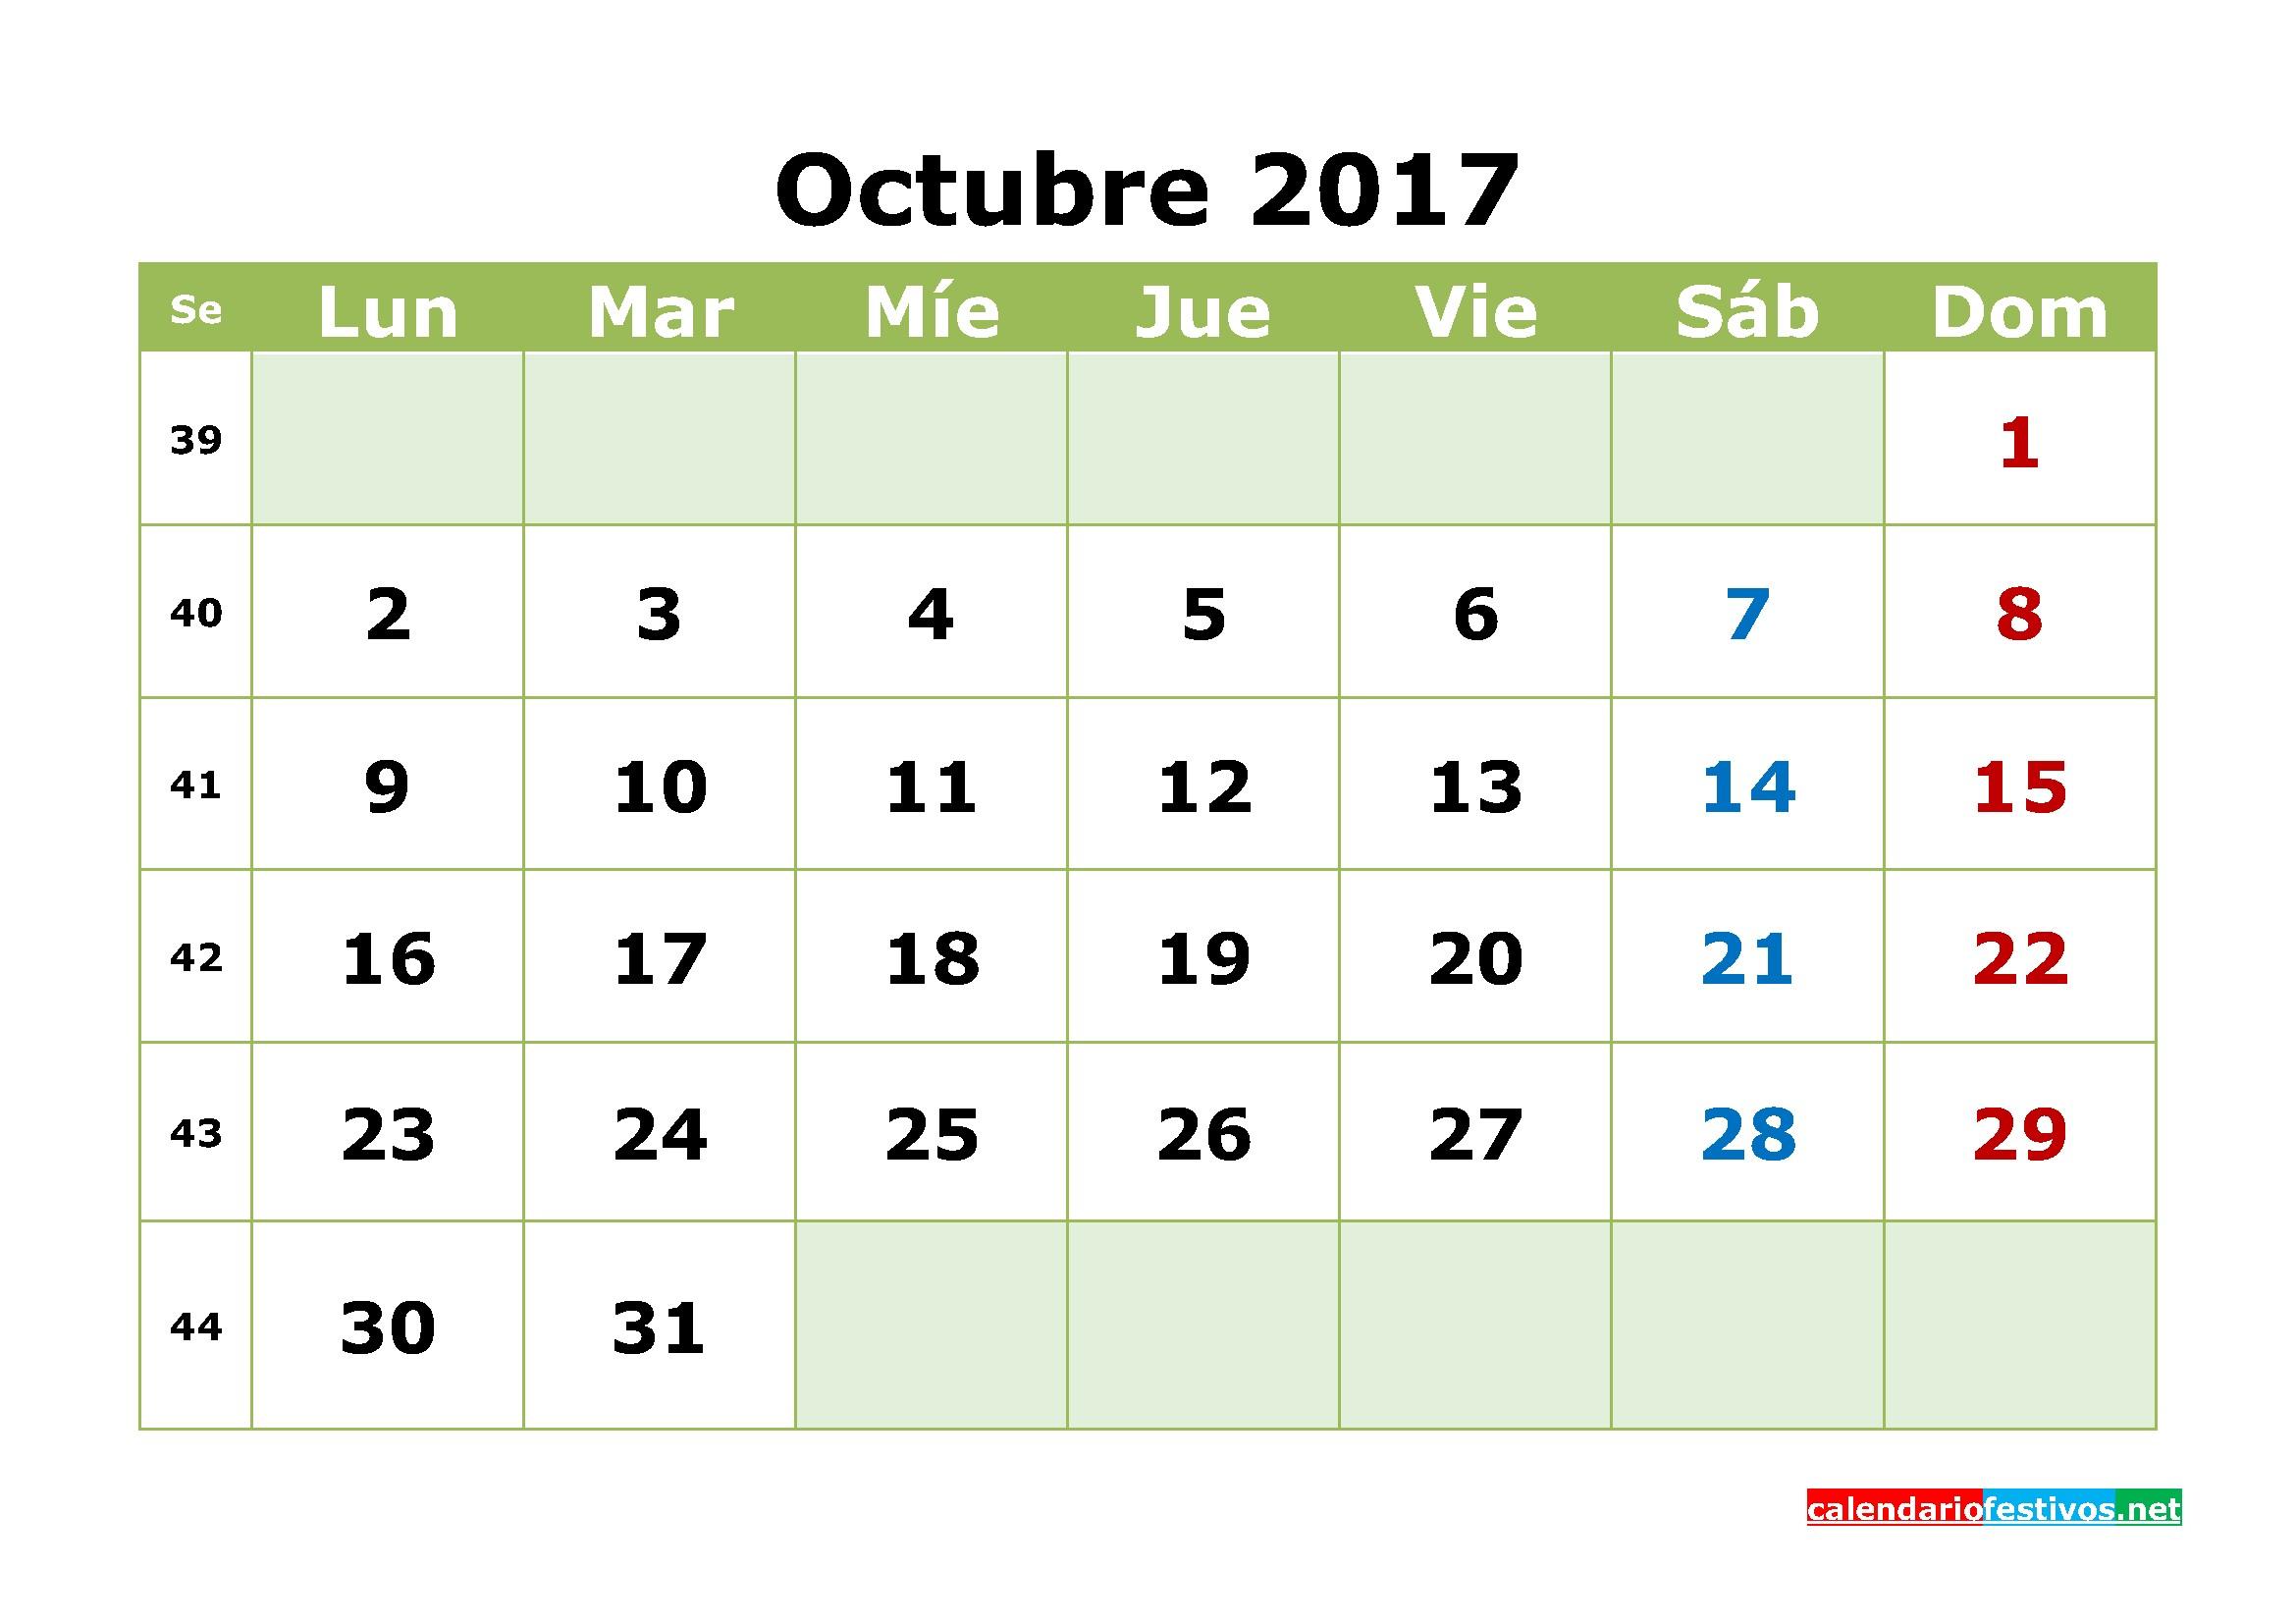 Calendario Octubre 2017 para imprimir calendario mensual 2017 gratis en formato de Calendario laboral Chile